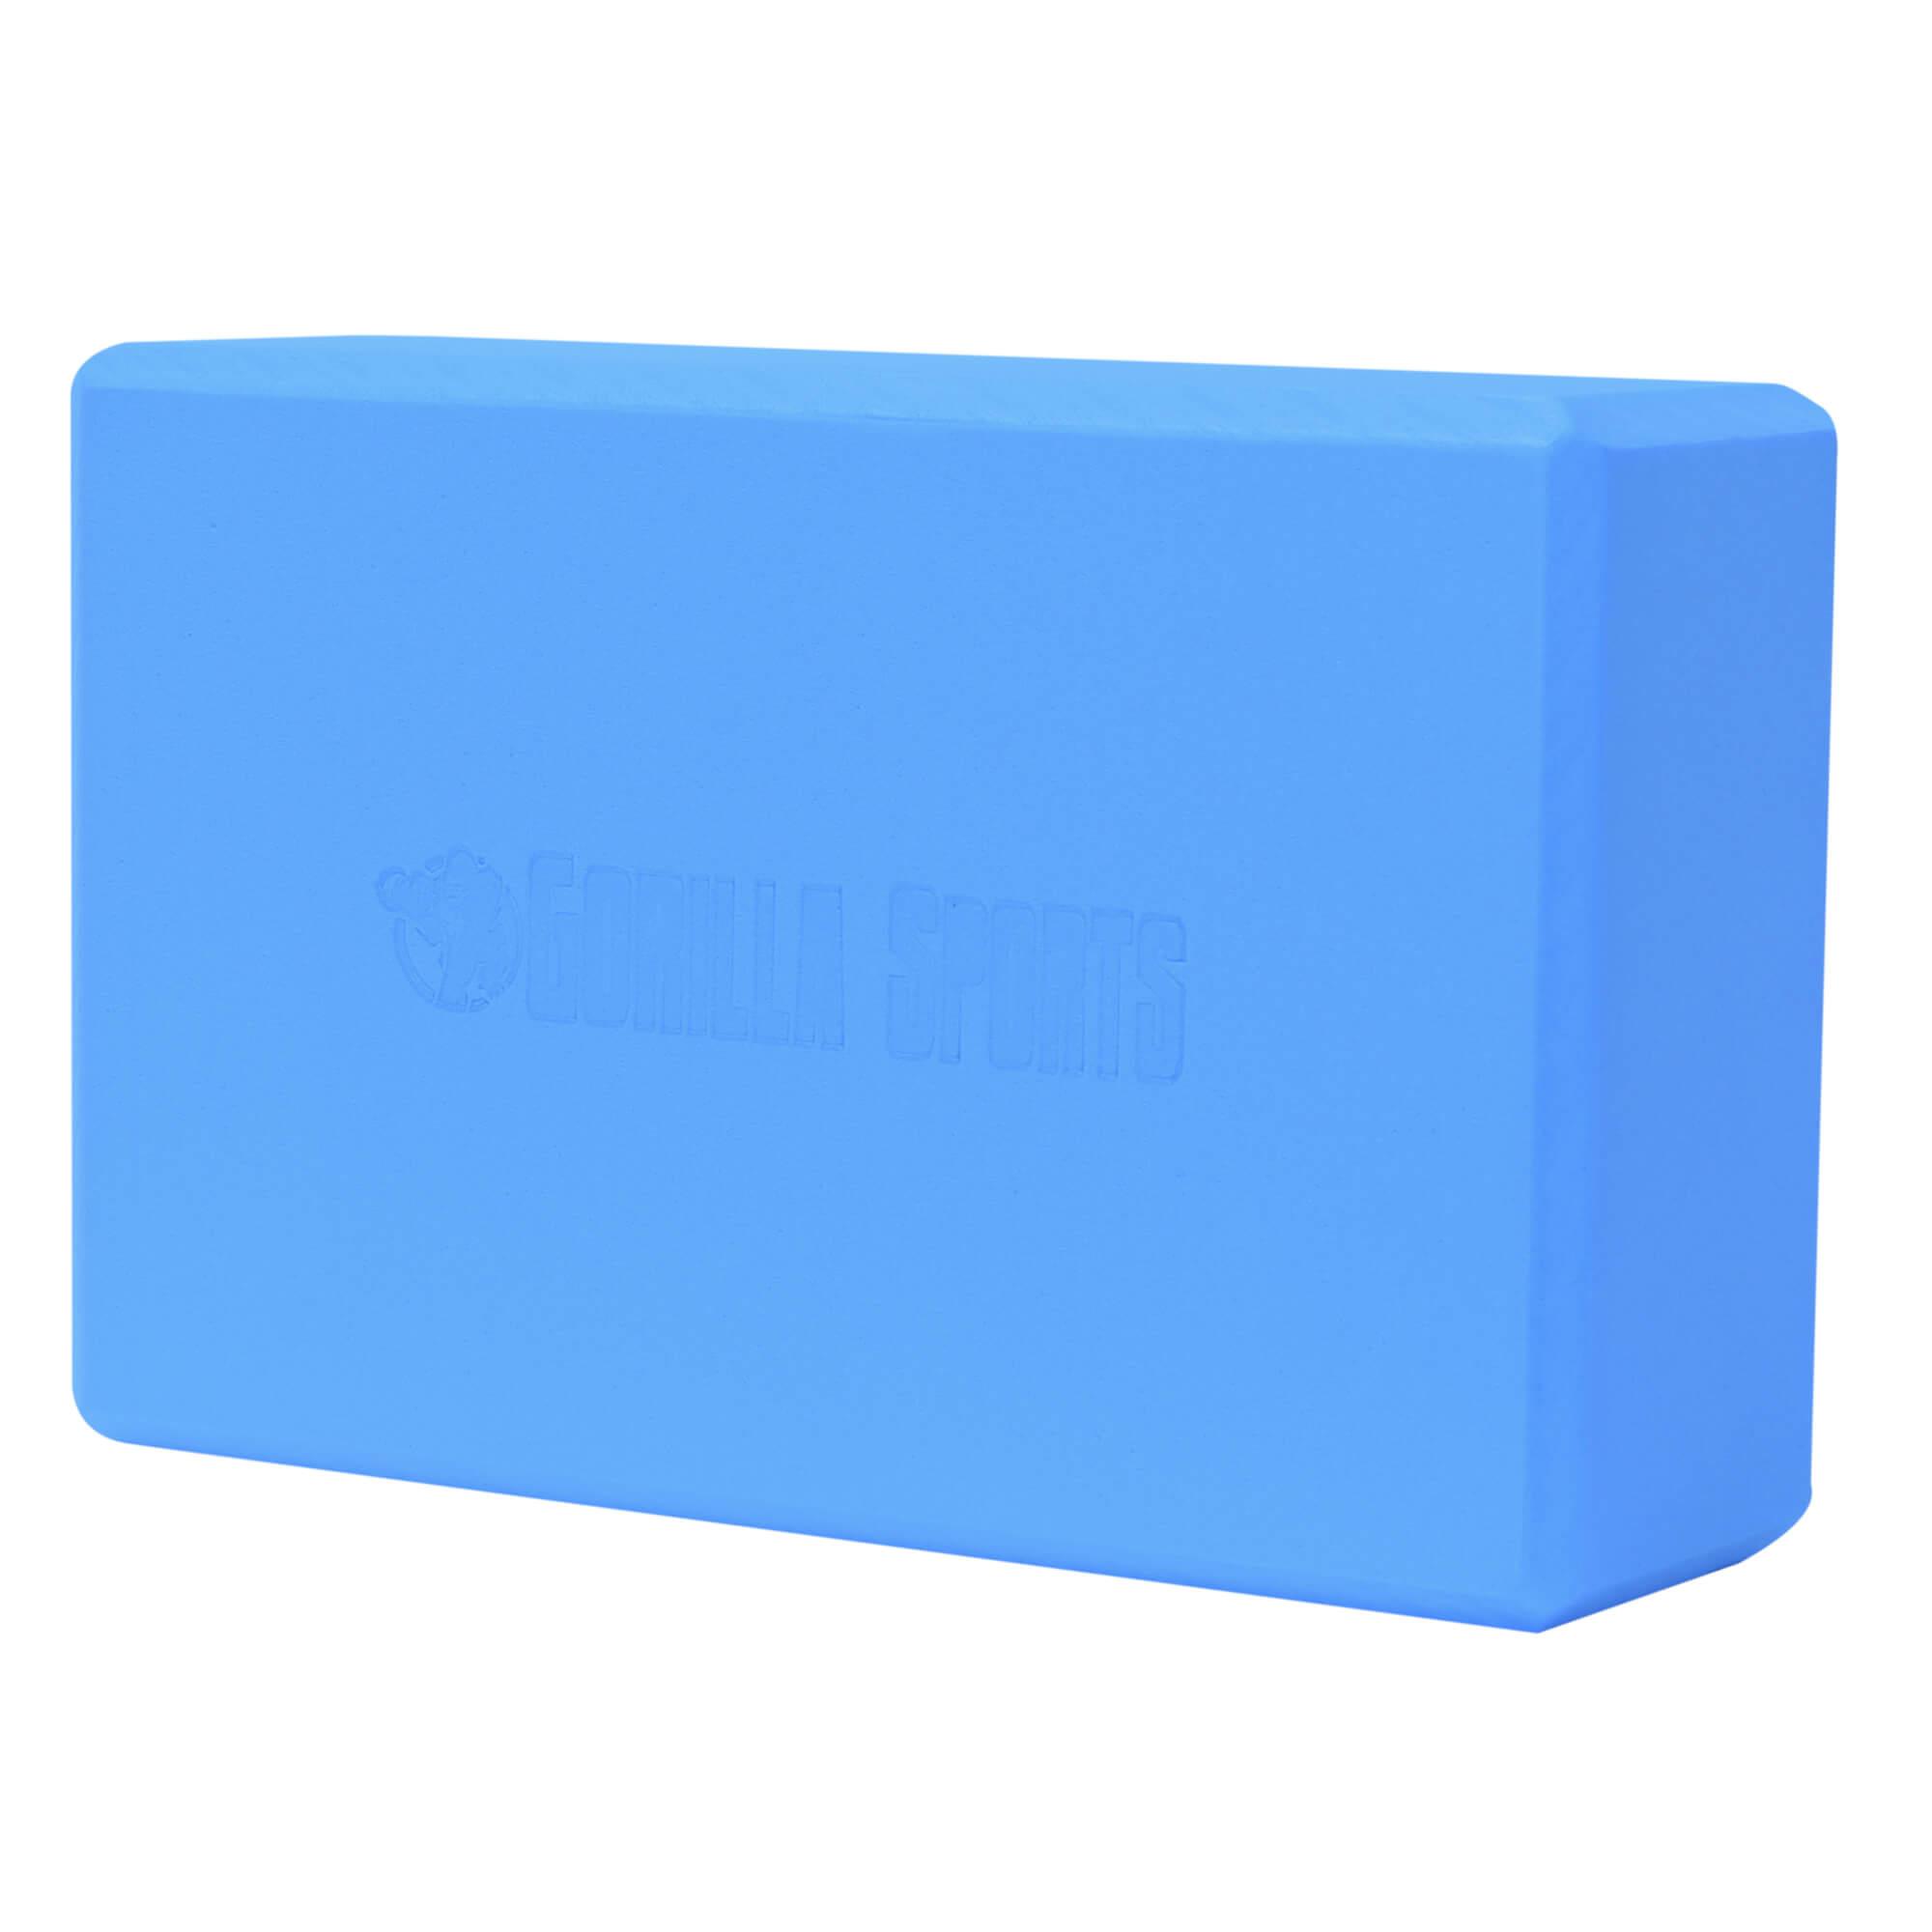 Yoga Block Blau